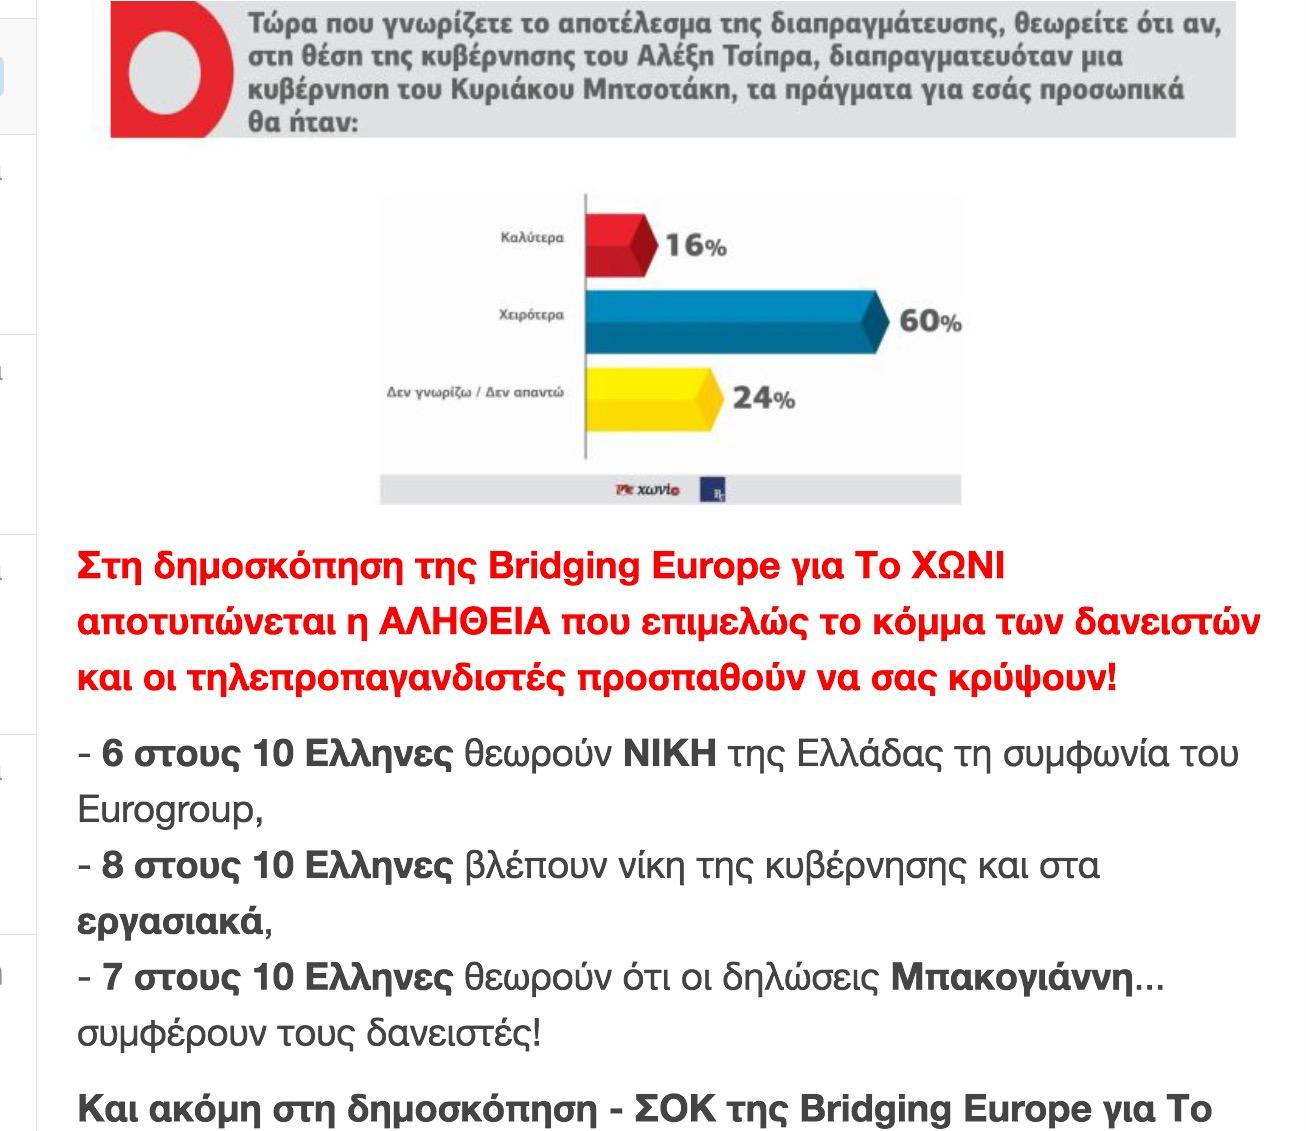 H πρώτη δημοσκόπηση ΜΕΤΑ το Eurogroup – 6 στους 10 Ελληνες είπαν..